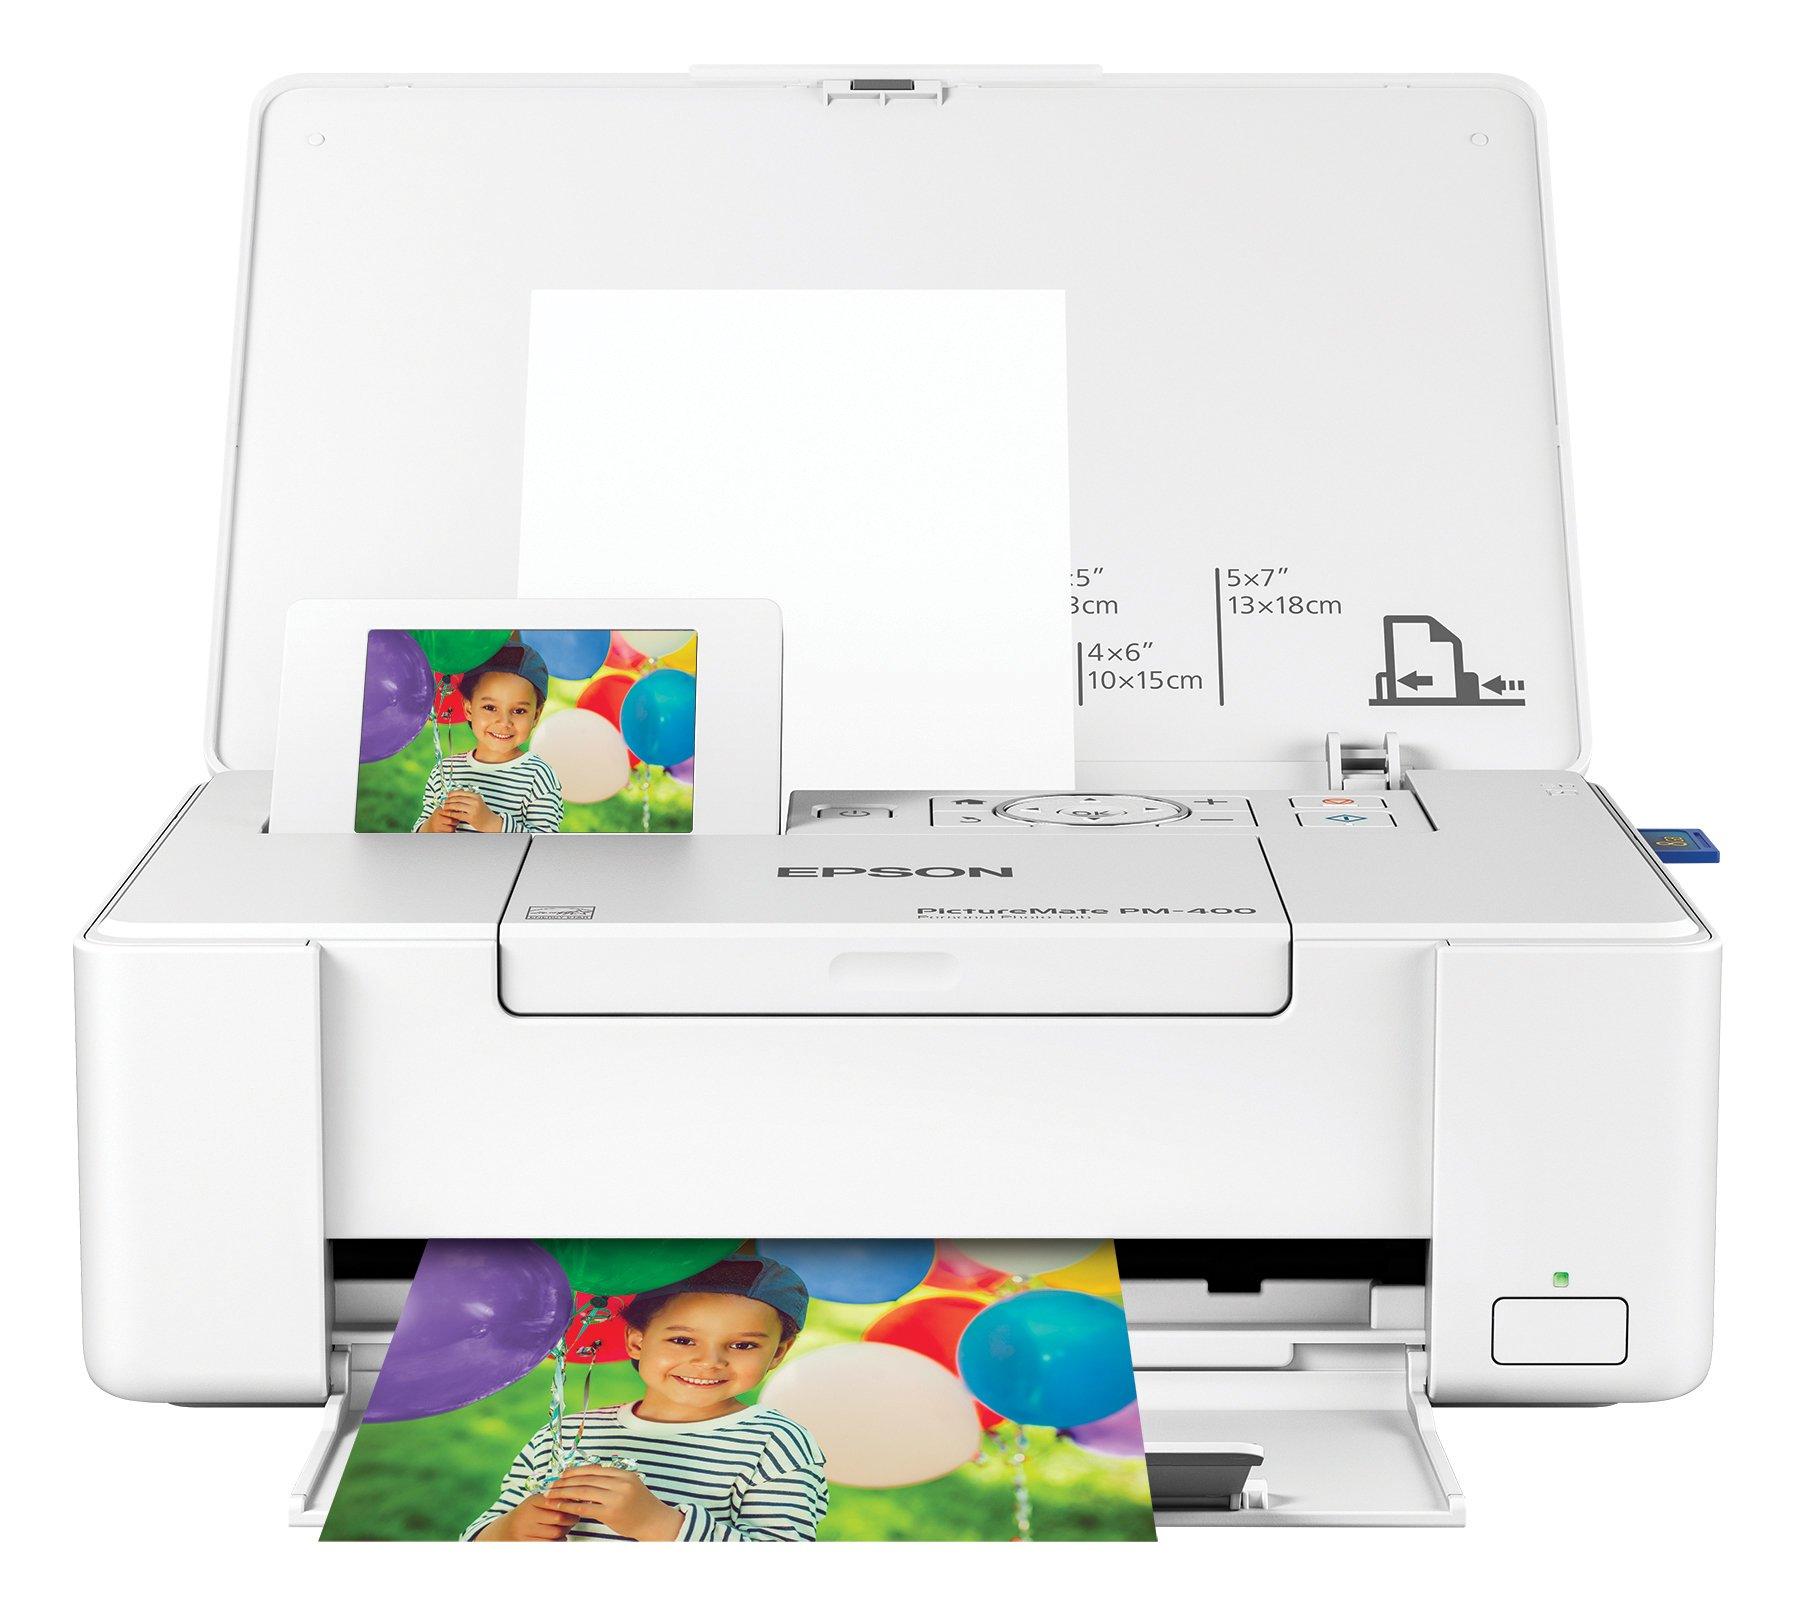 Epson PictureMate PM-400 Wireless Compact Color Photo Printer by Epson